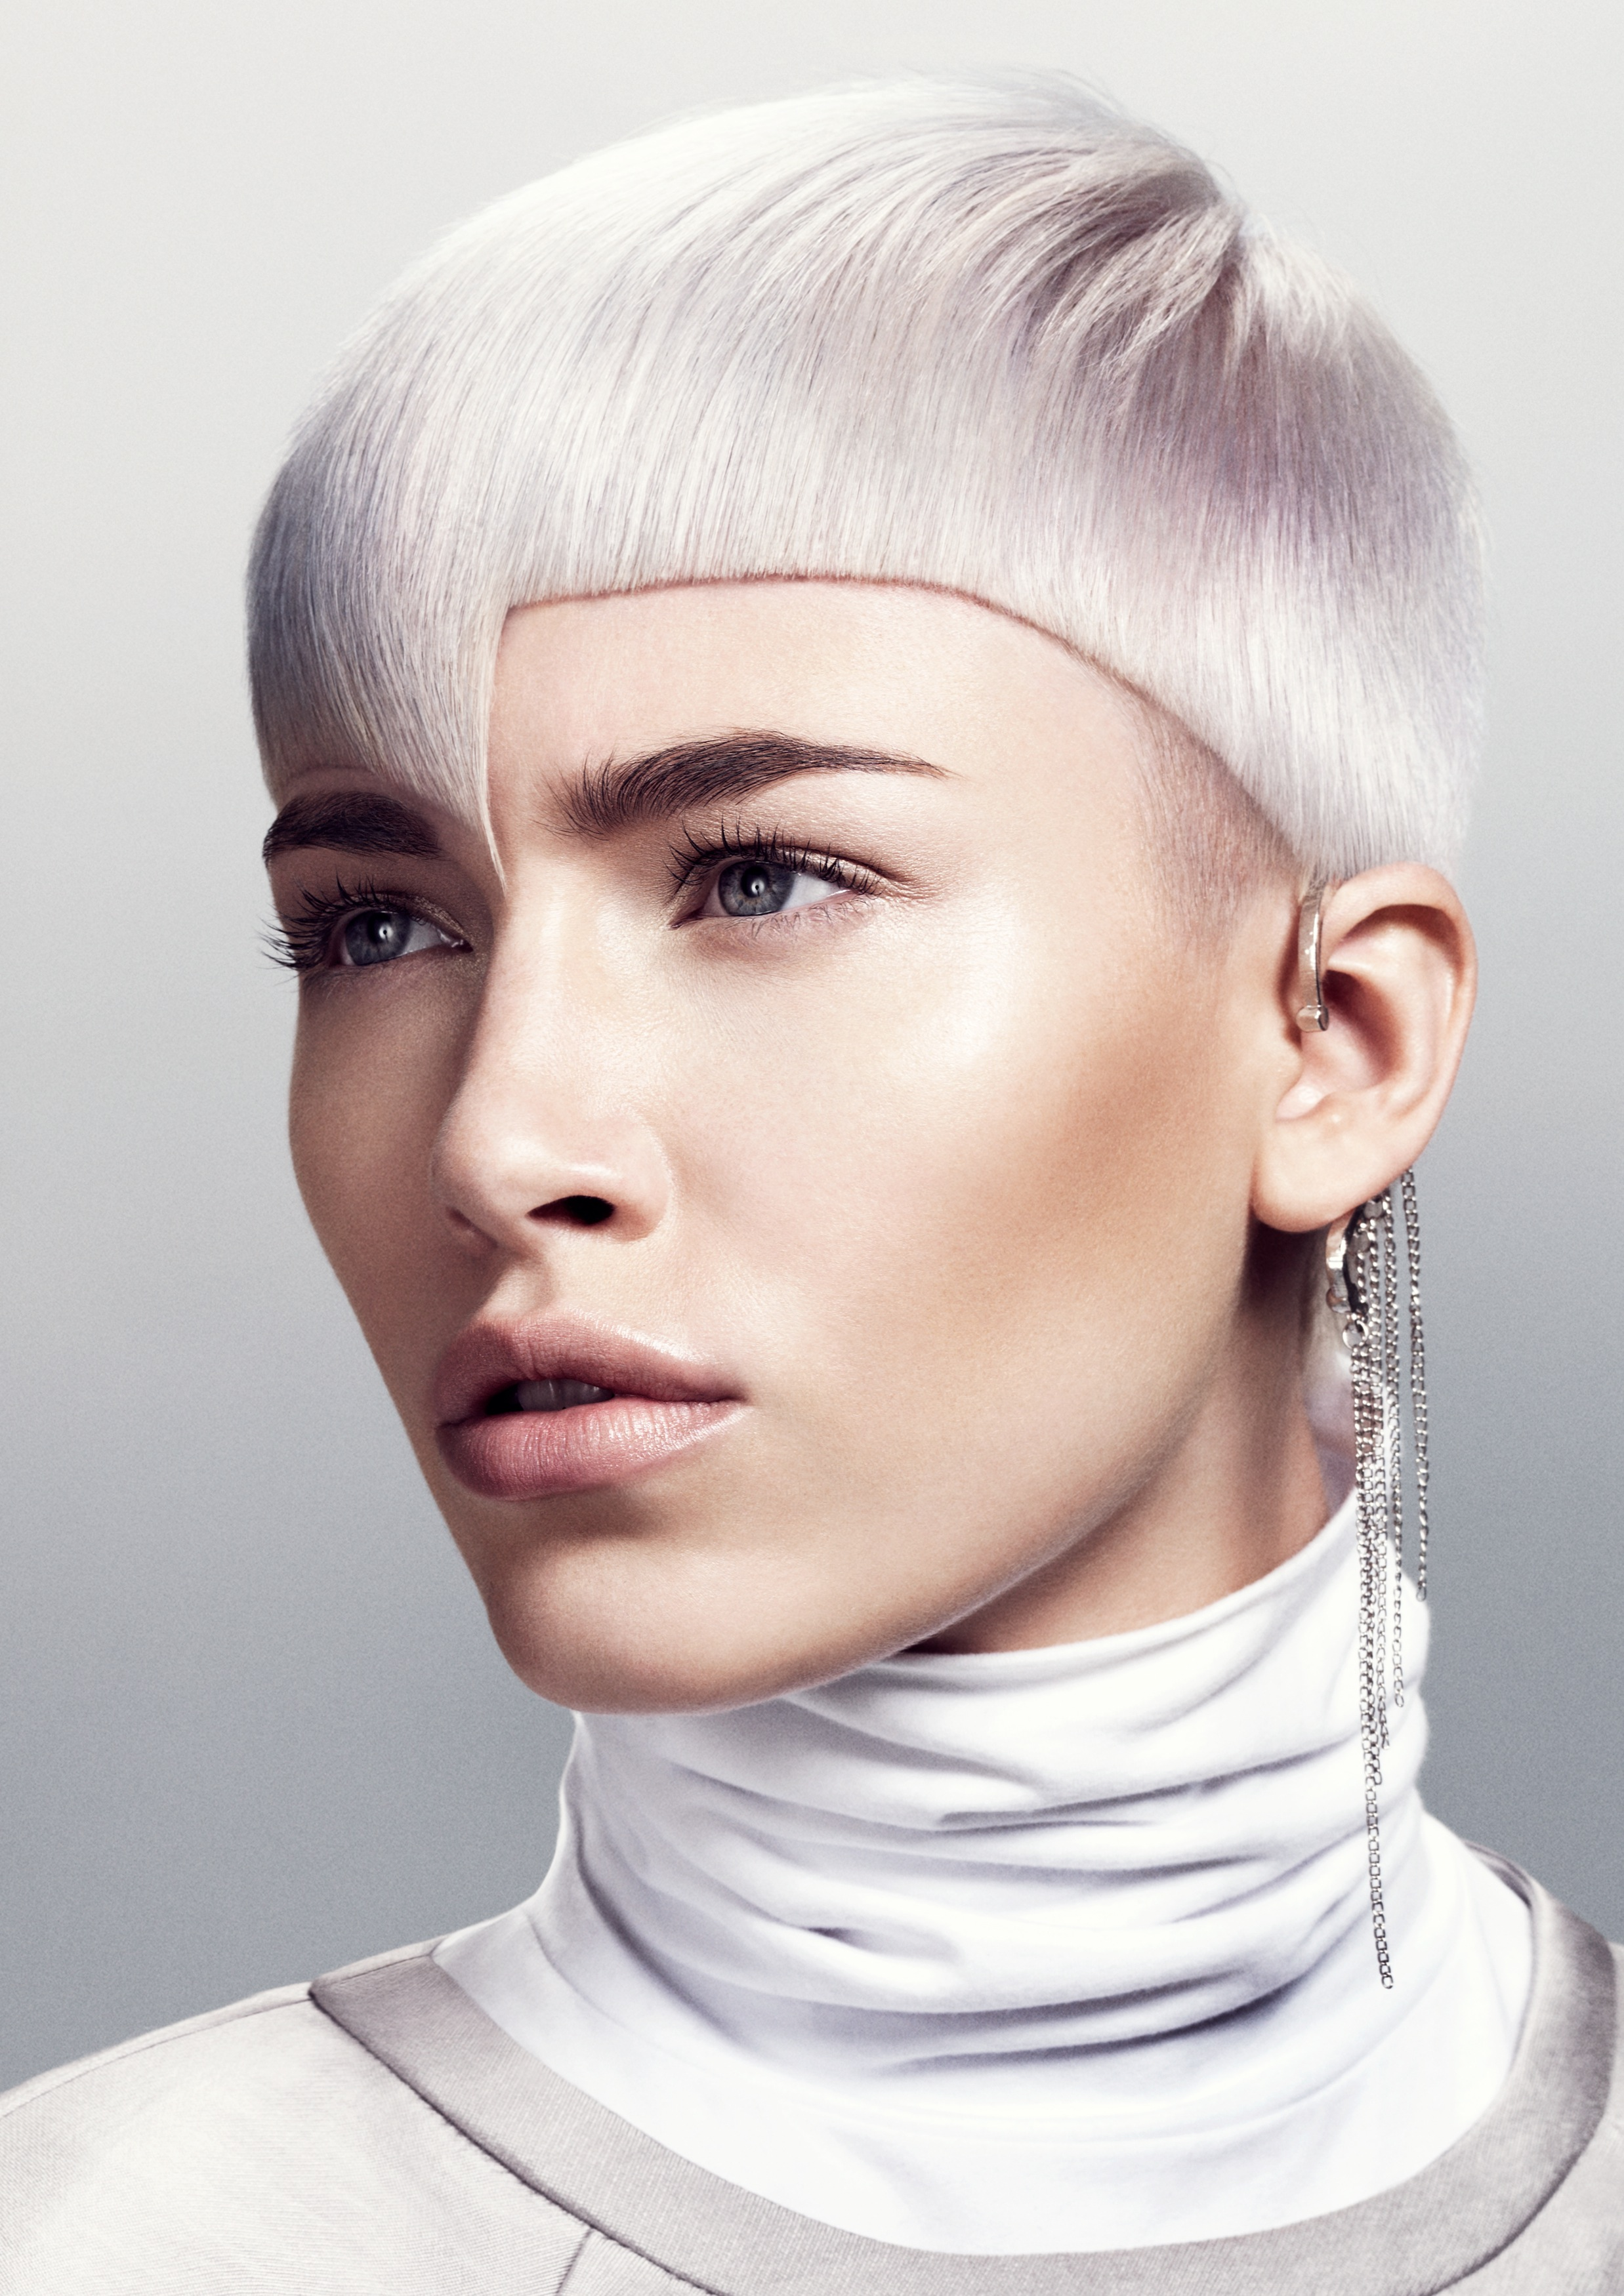 hairstyle by Scott Sloan 2